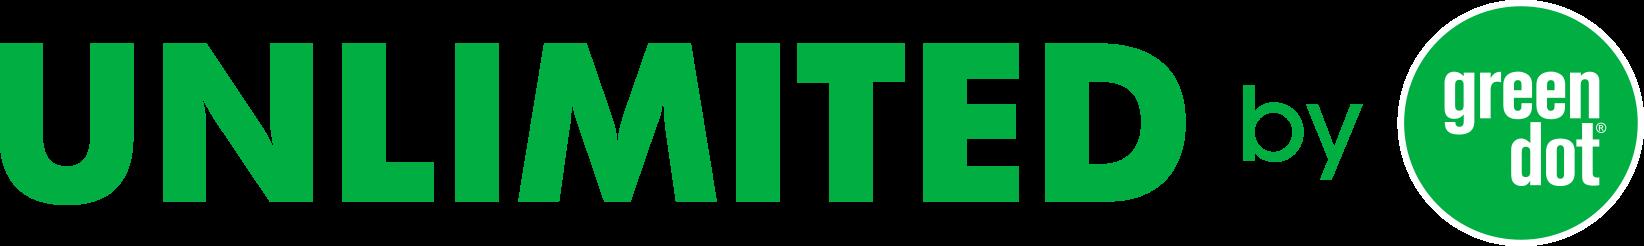 Green Dot - Unlimited Cash Back Mobile Account & Debit Cards